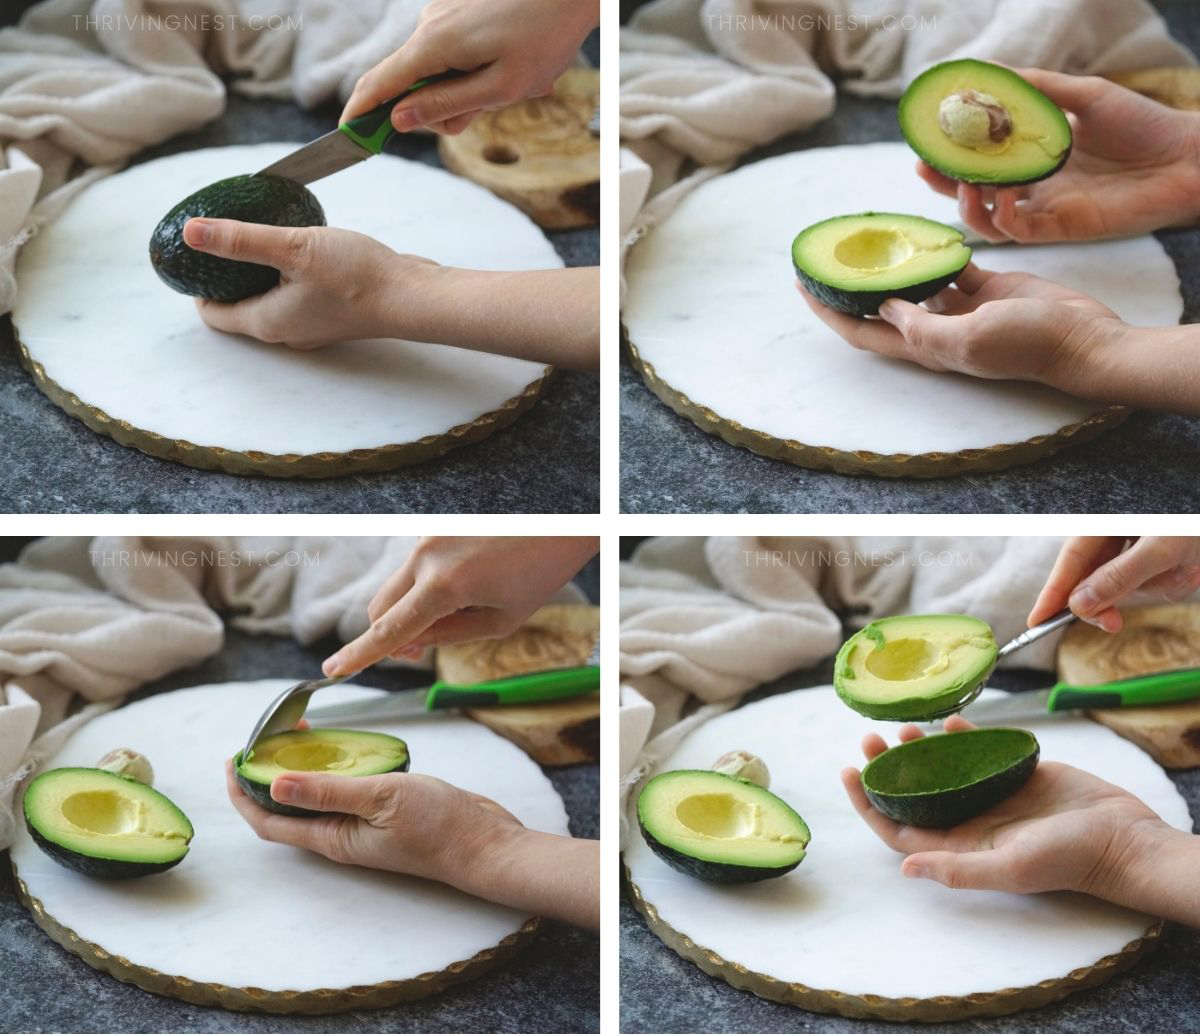 How to prepare avocado for baby - process shots.